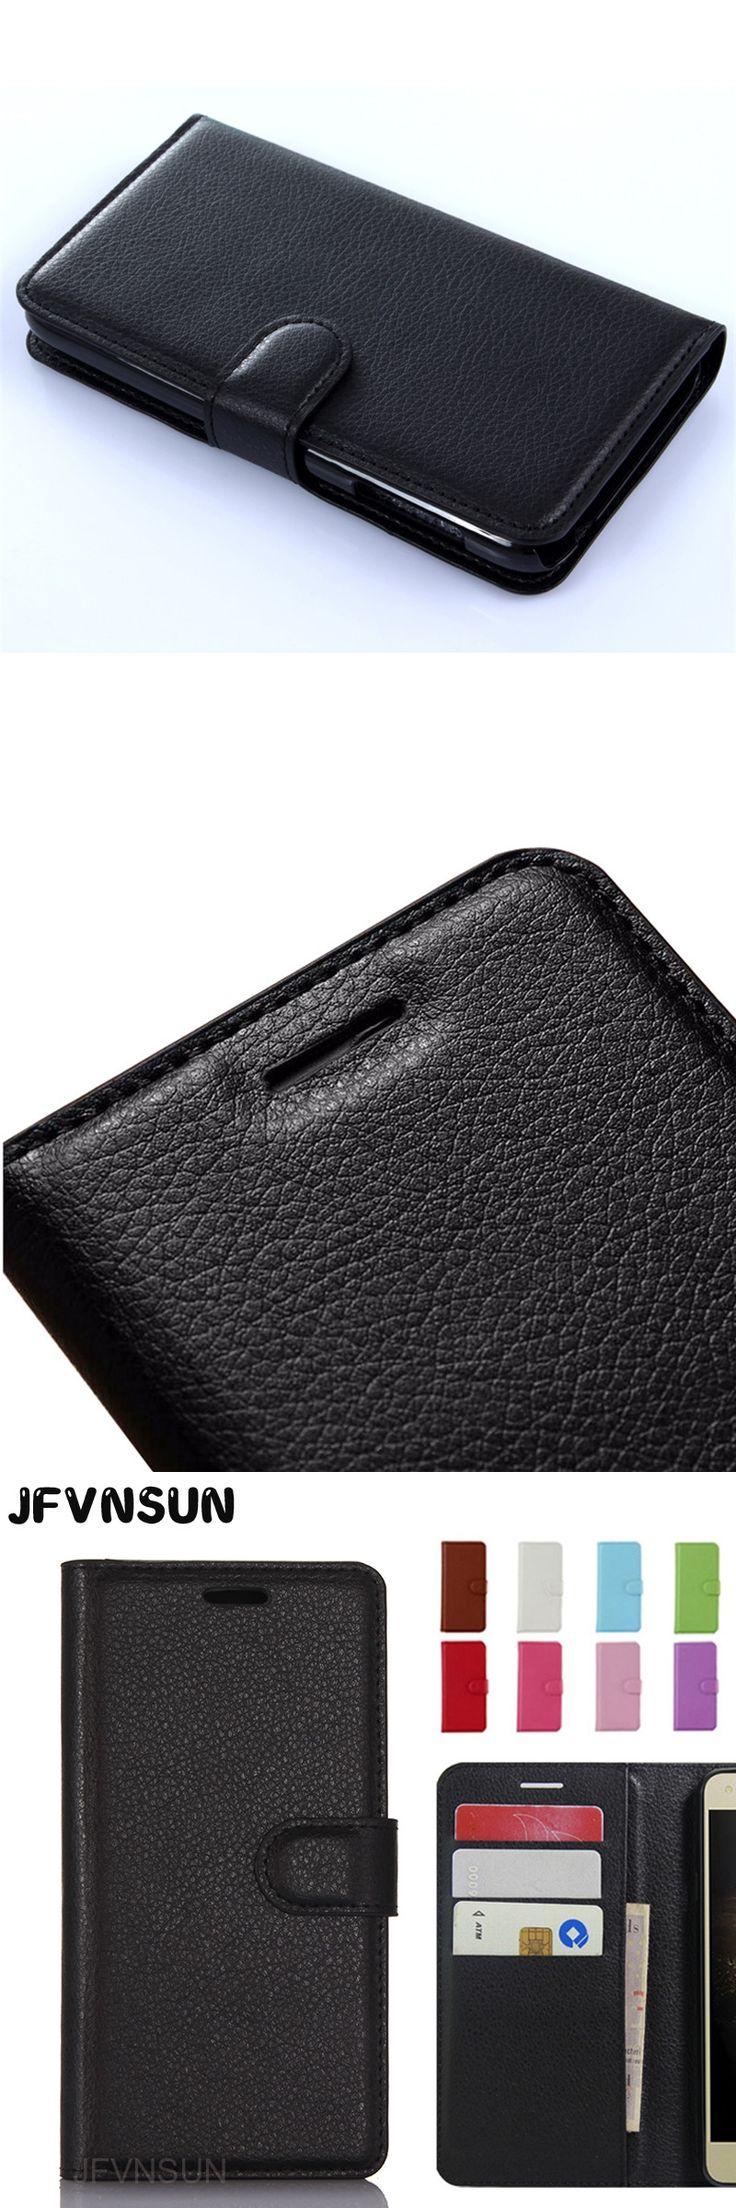 For Samsung J7 2016 Prime Case Leather Flip Cover for SAMSUNG Galaxy J7 2015 J710 2016 J7 Prime Wallet Magnetic Stand Phone Bag